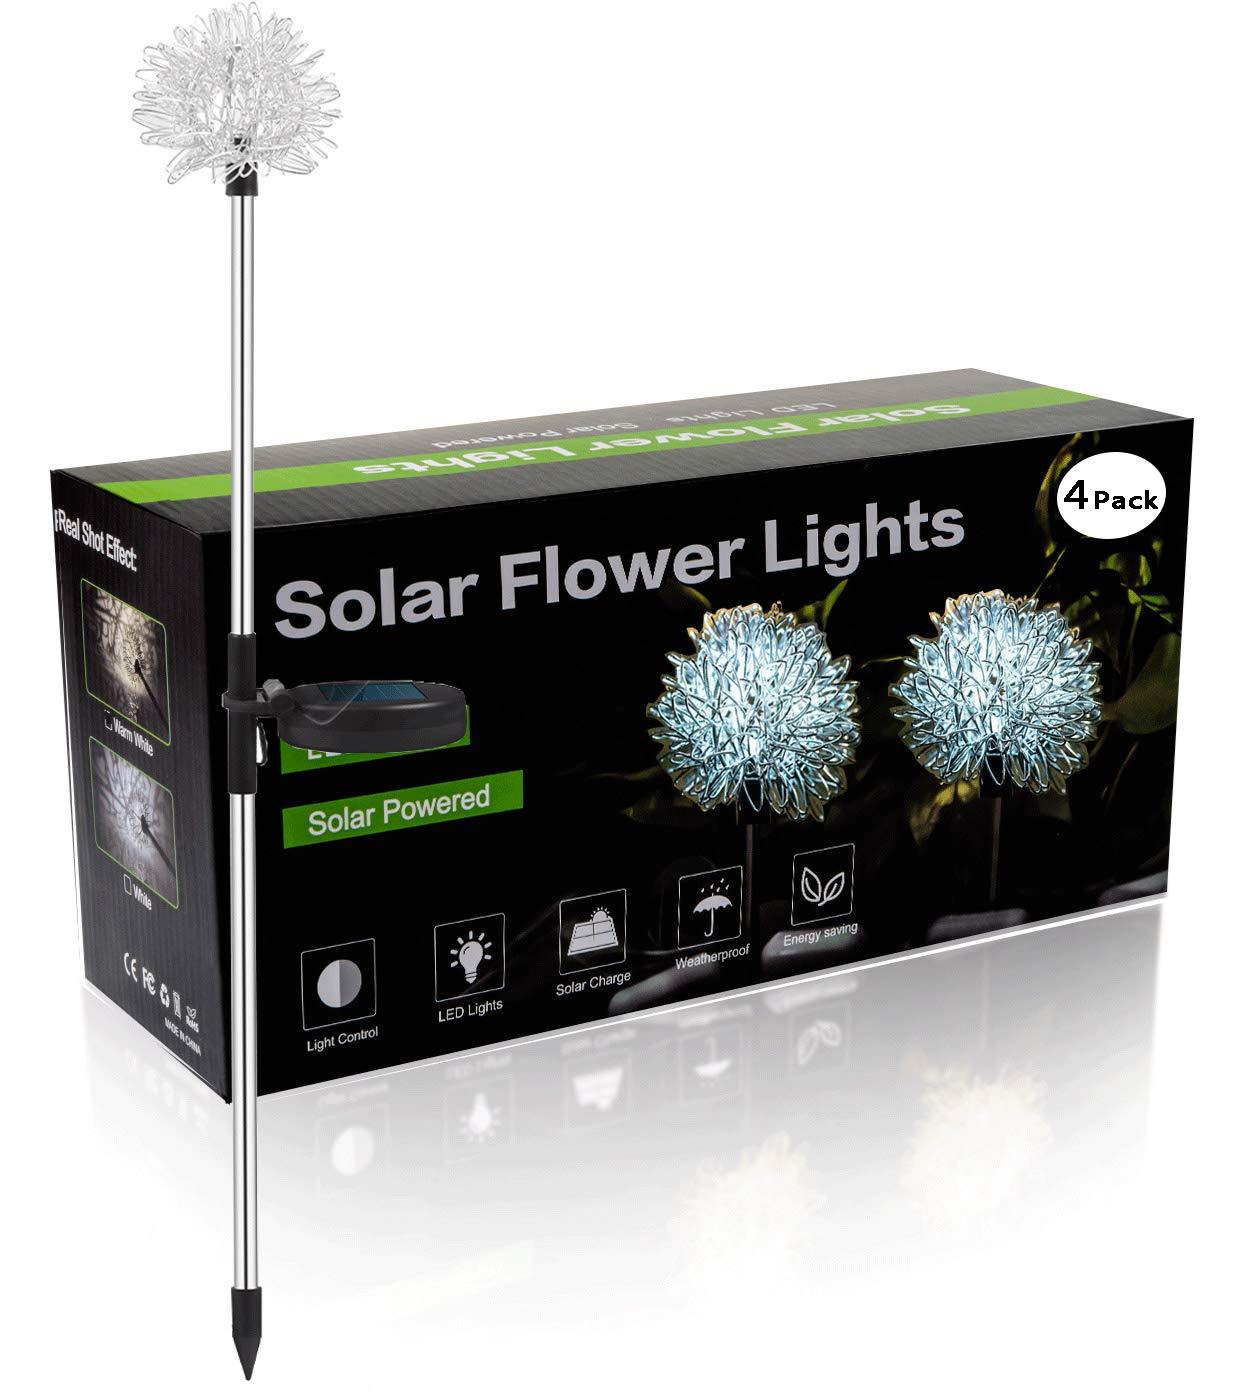 YIYAYIYAYO 4 Pack Solar Garden Lights Outdoor, LED Stake Landscape Lighting with Dandelion Flower, Waterproof/Auto On/Off - Decorative Figurine Lights for Garden/Patio/Landscape/Pathway/Backyard